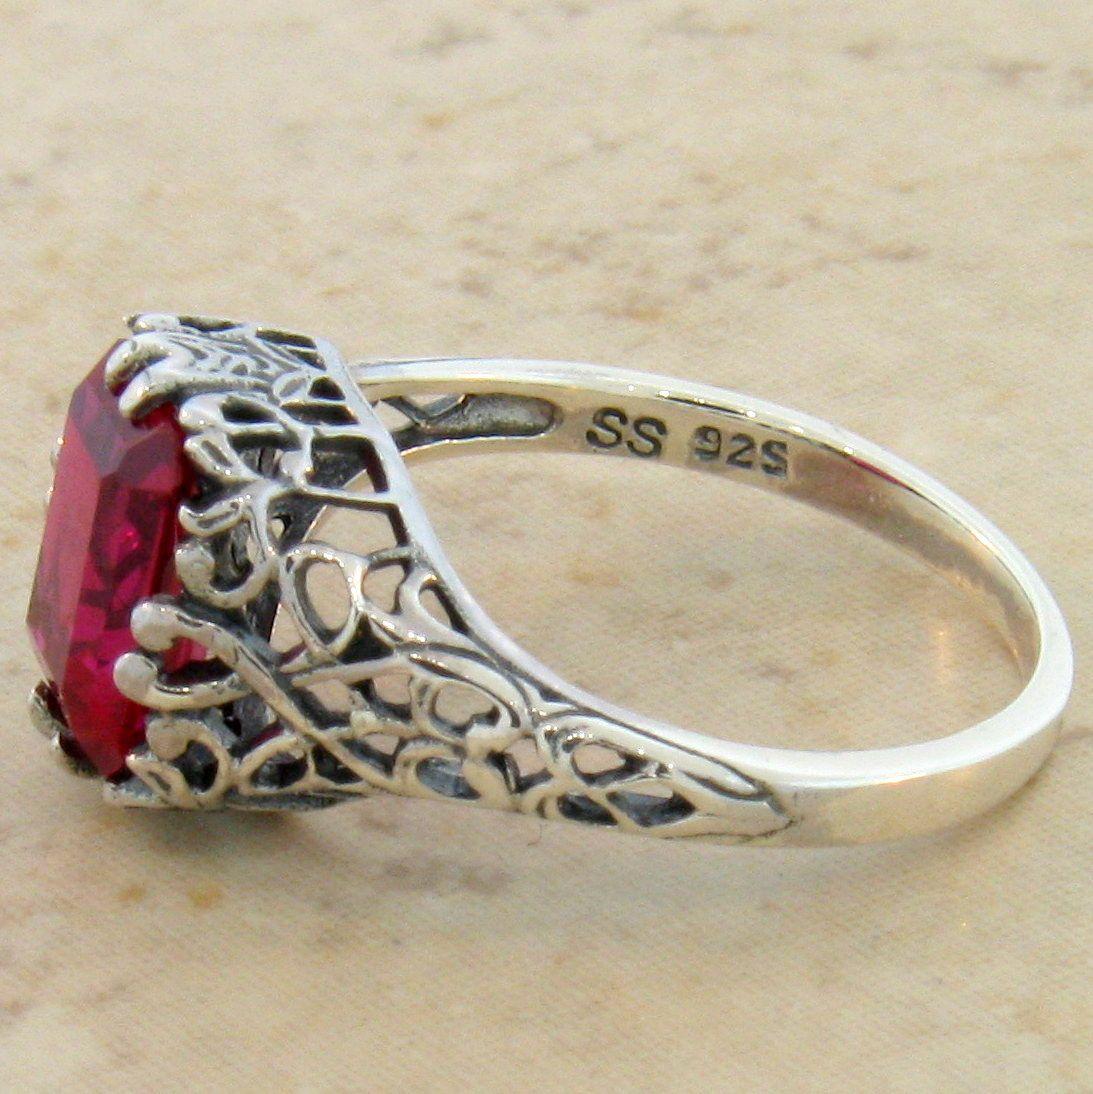 Antique Filigree Design 925 Sterling Silver Red Lab Ruby Ring 820 Ebay